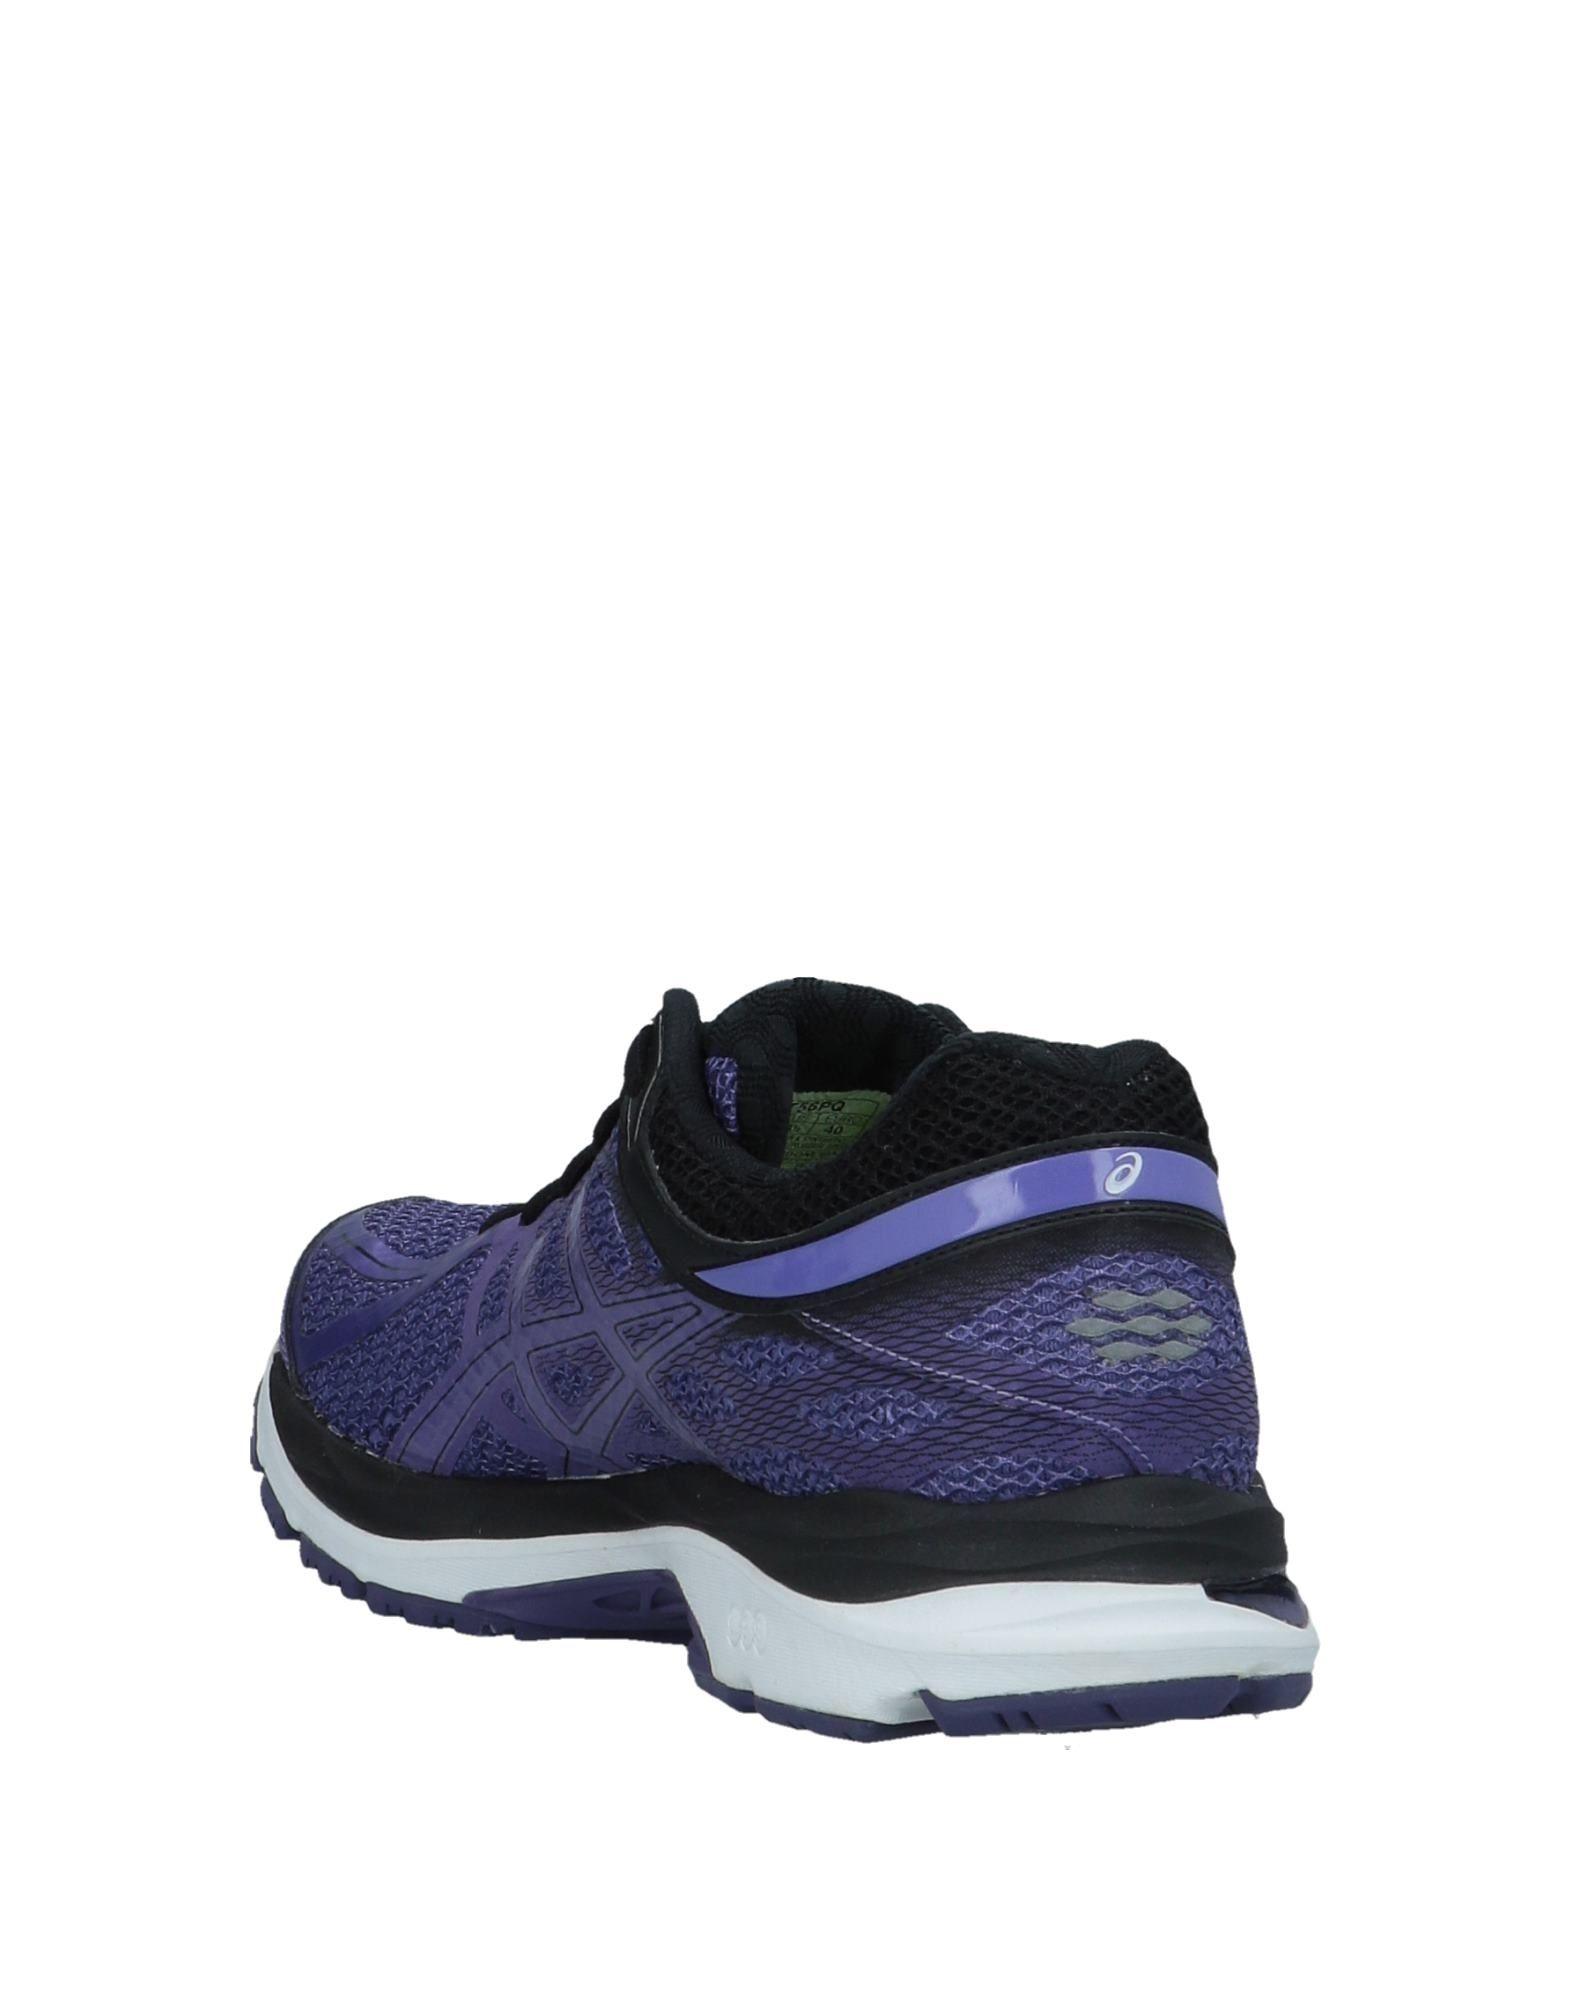 Asics Sneakers Damen Damen Sneakers  11538807ML  35ffa0